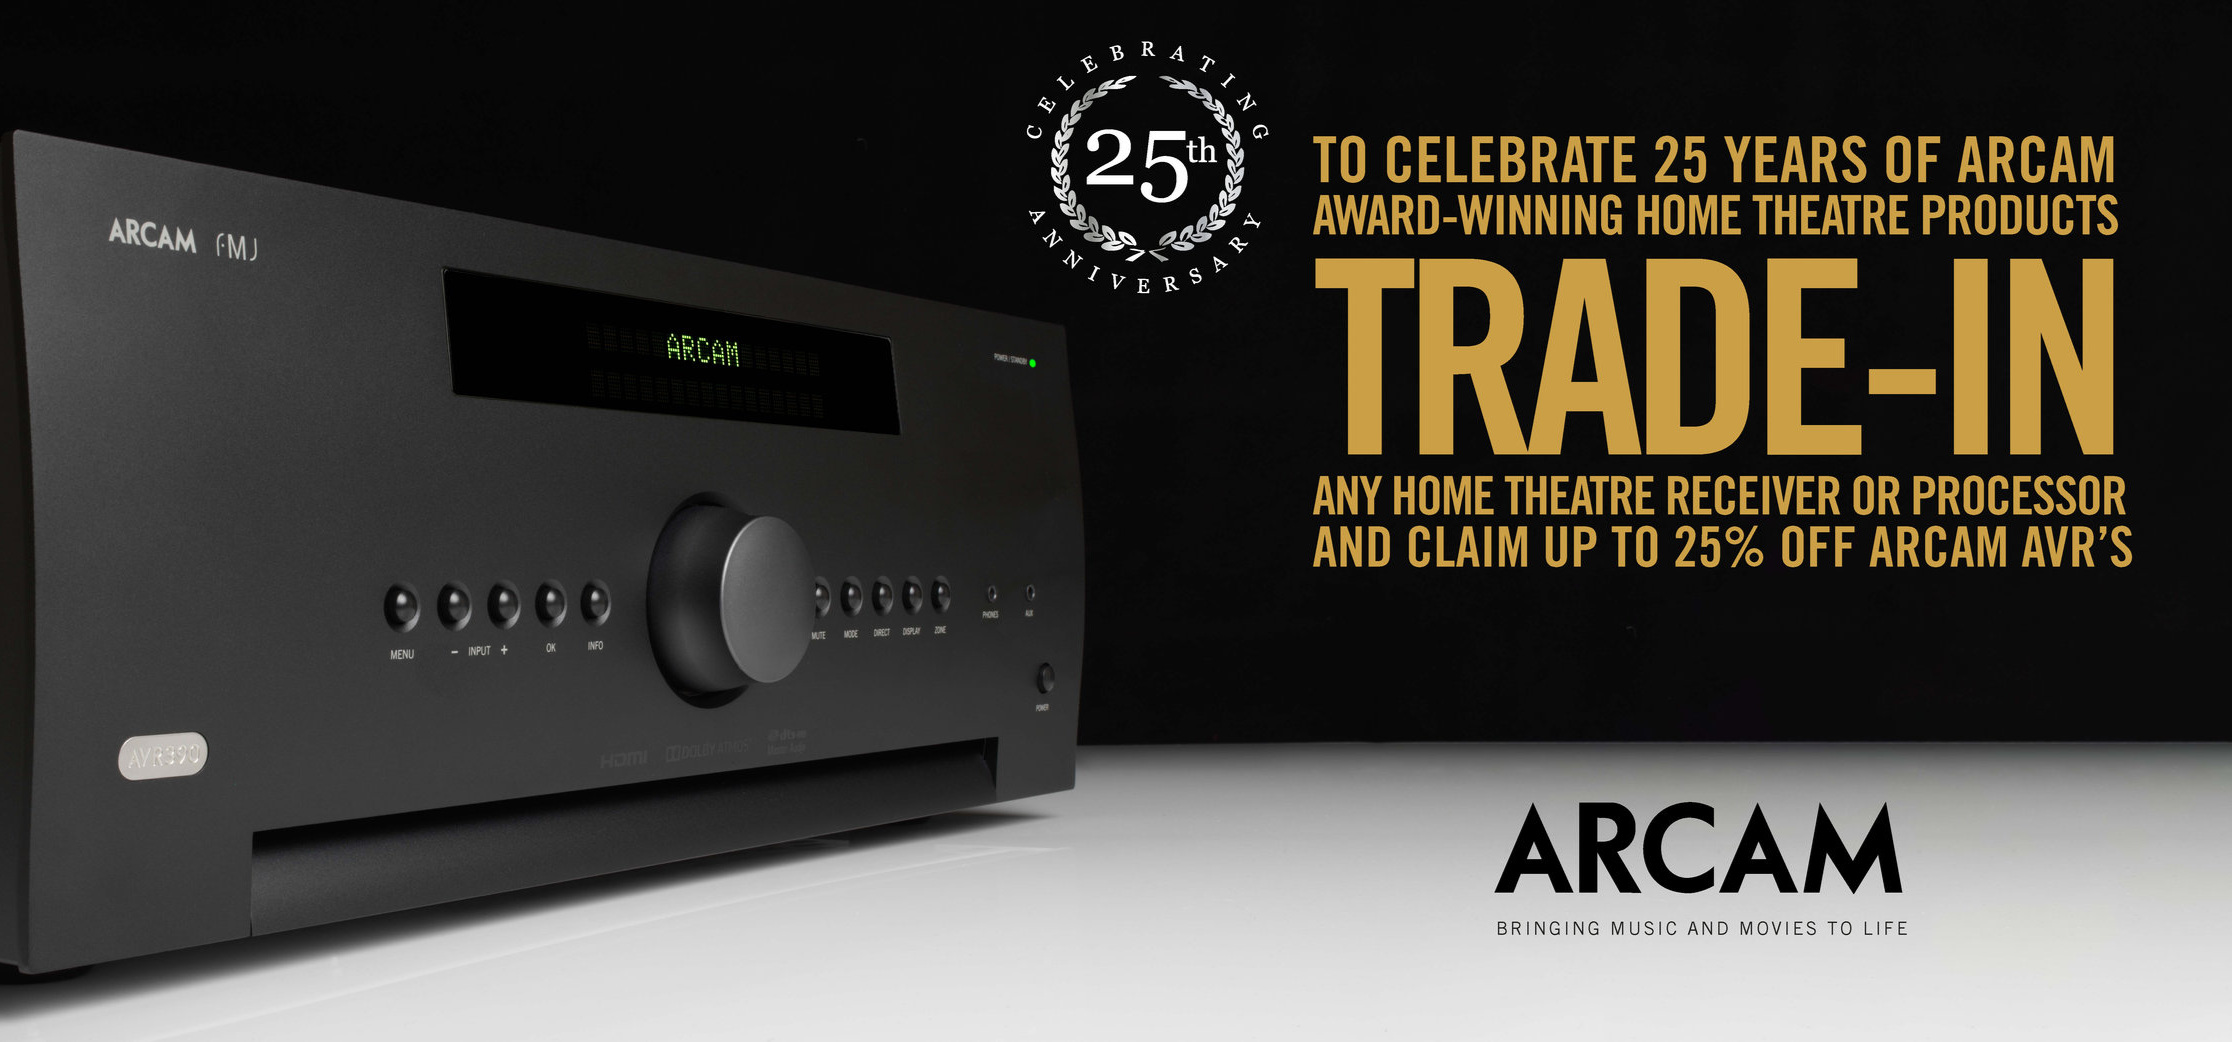 Arcam+trade-in+web+banner-01.jpg